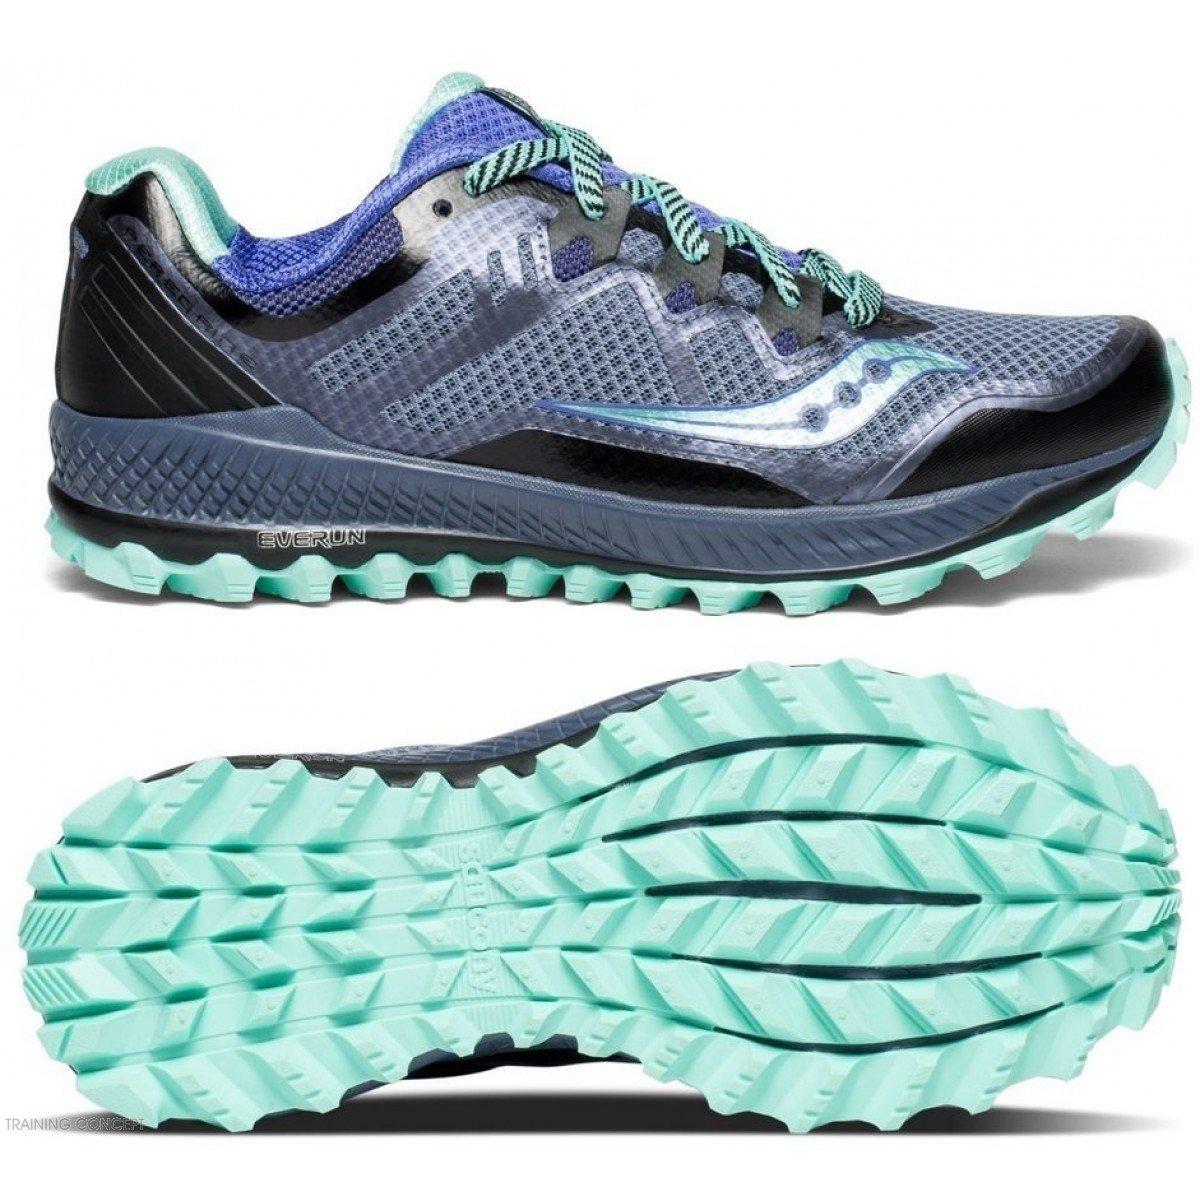 s10424 running de trail 8 chaussures saucony 35 femmes peregrine srxhCtQd